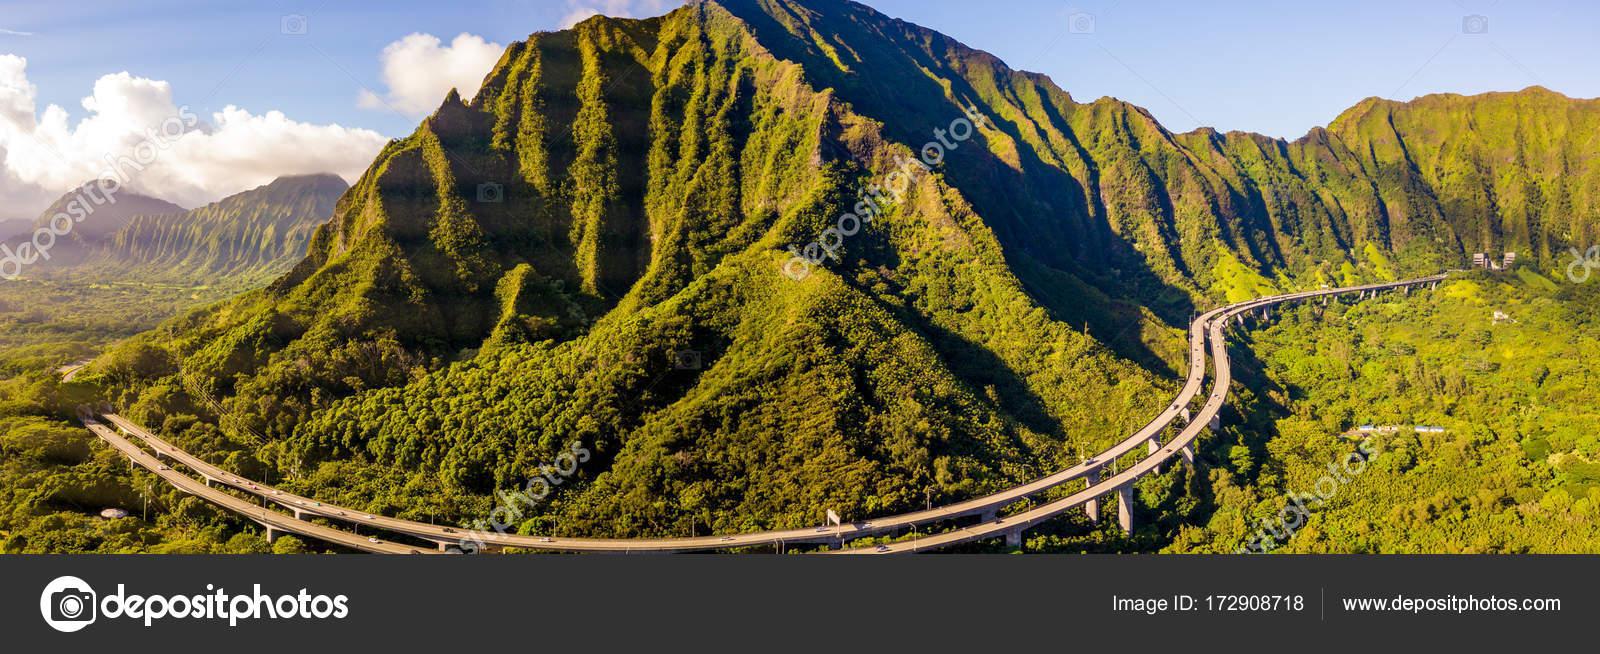 Gorgeous Aerial View Oahu Green Mountains View Omaluhia Botanical ...